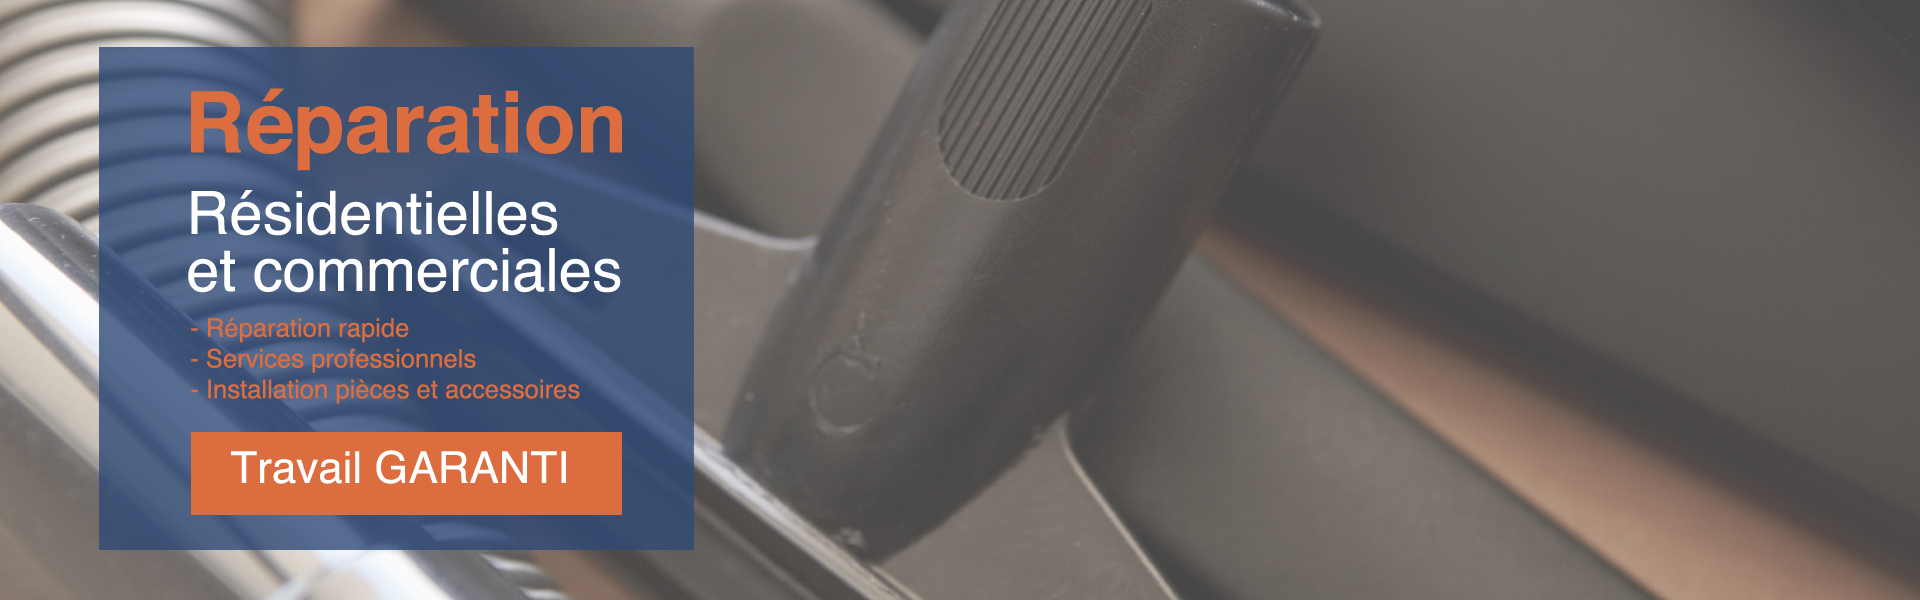 aspirateurs-samson-vente-reparation-accueil-1920x600-04